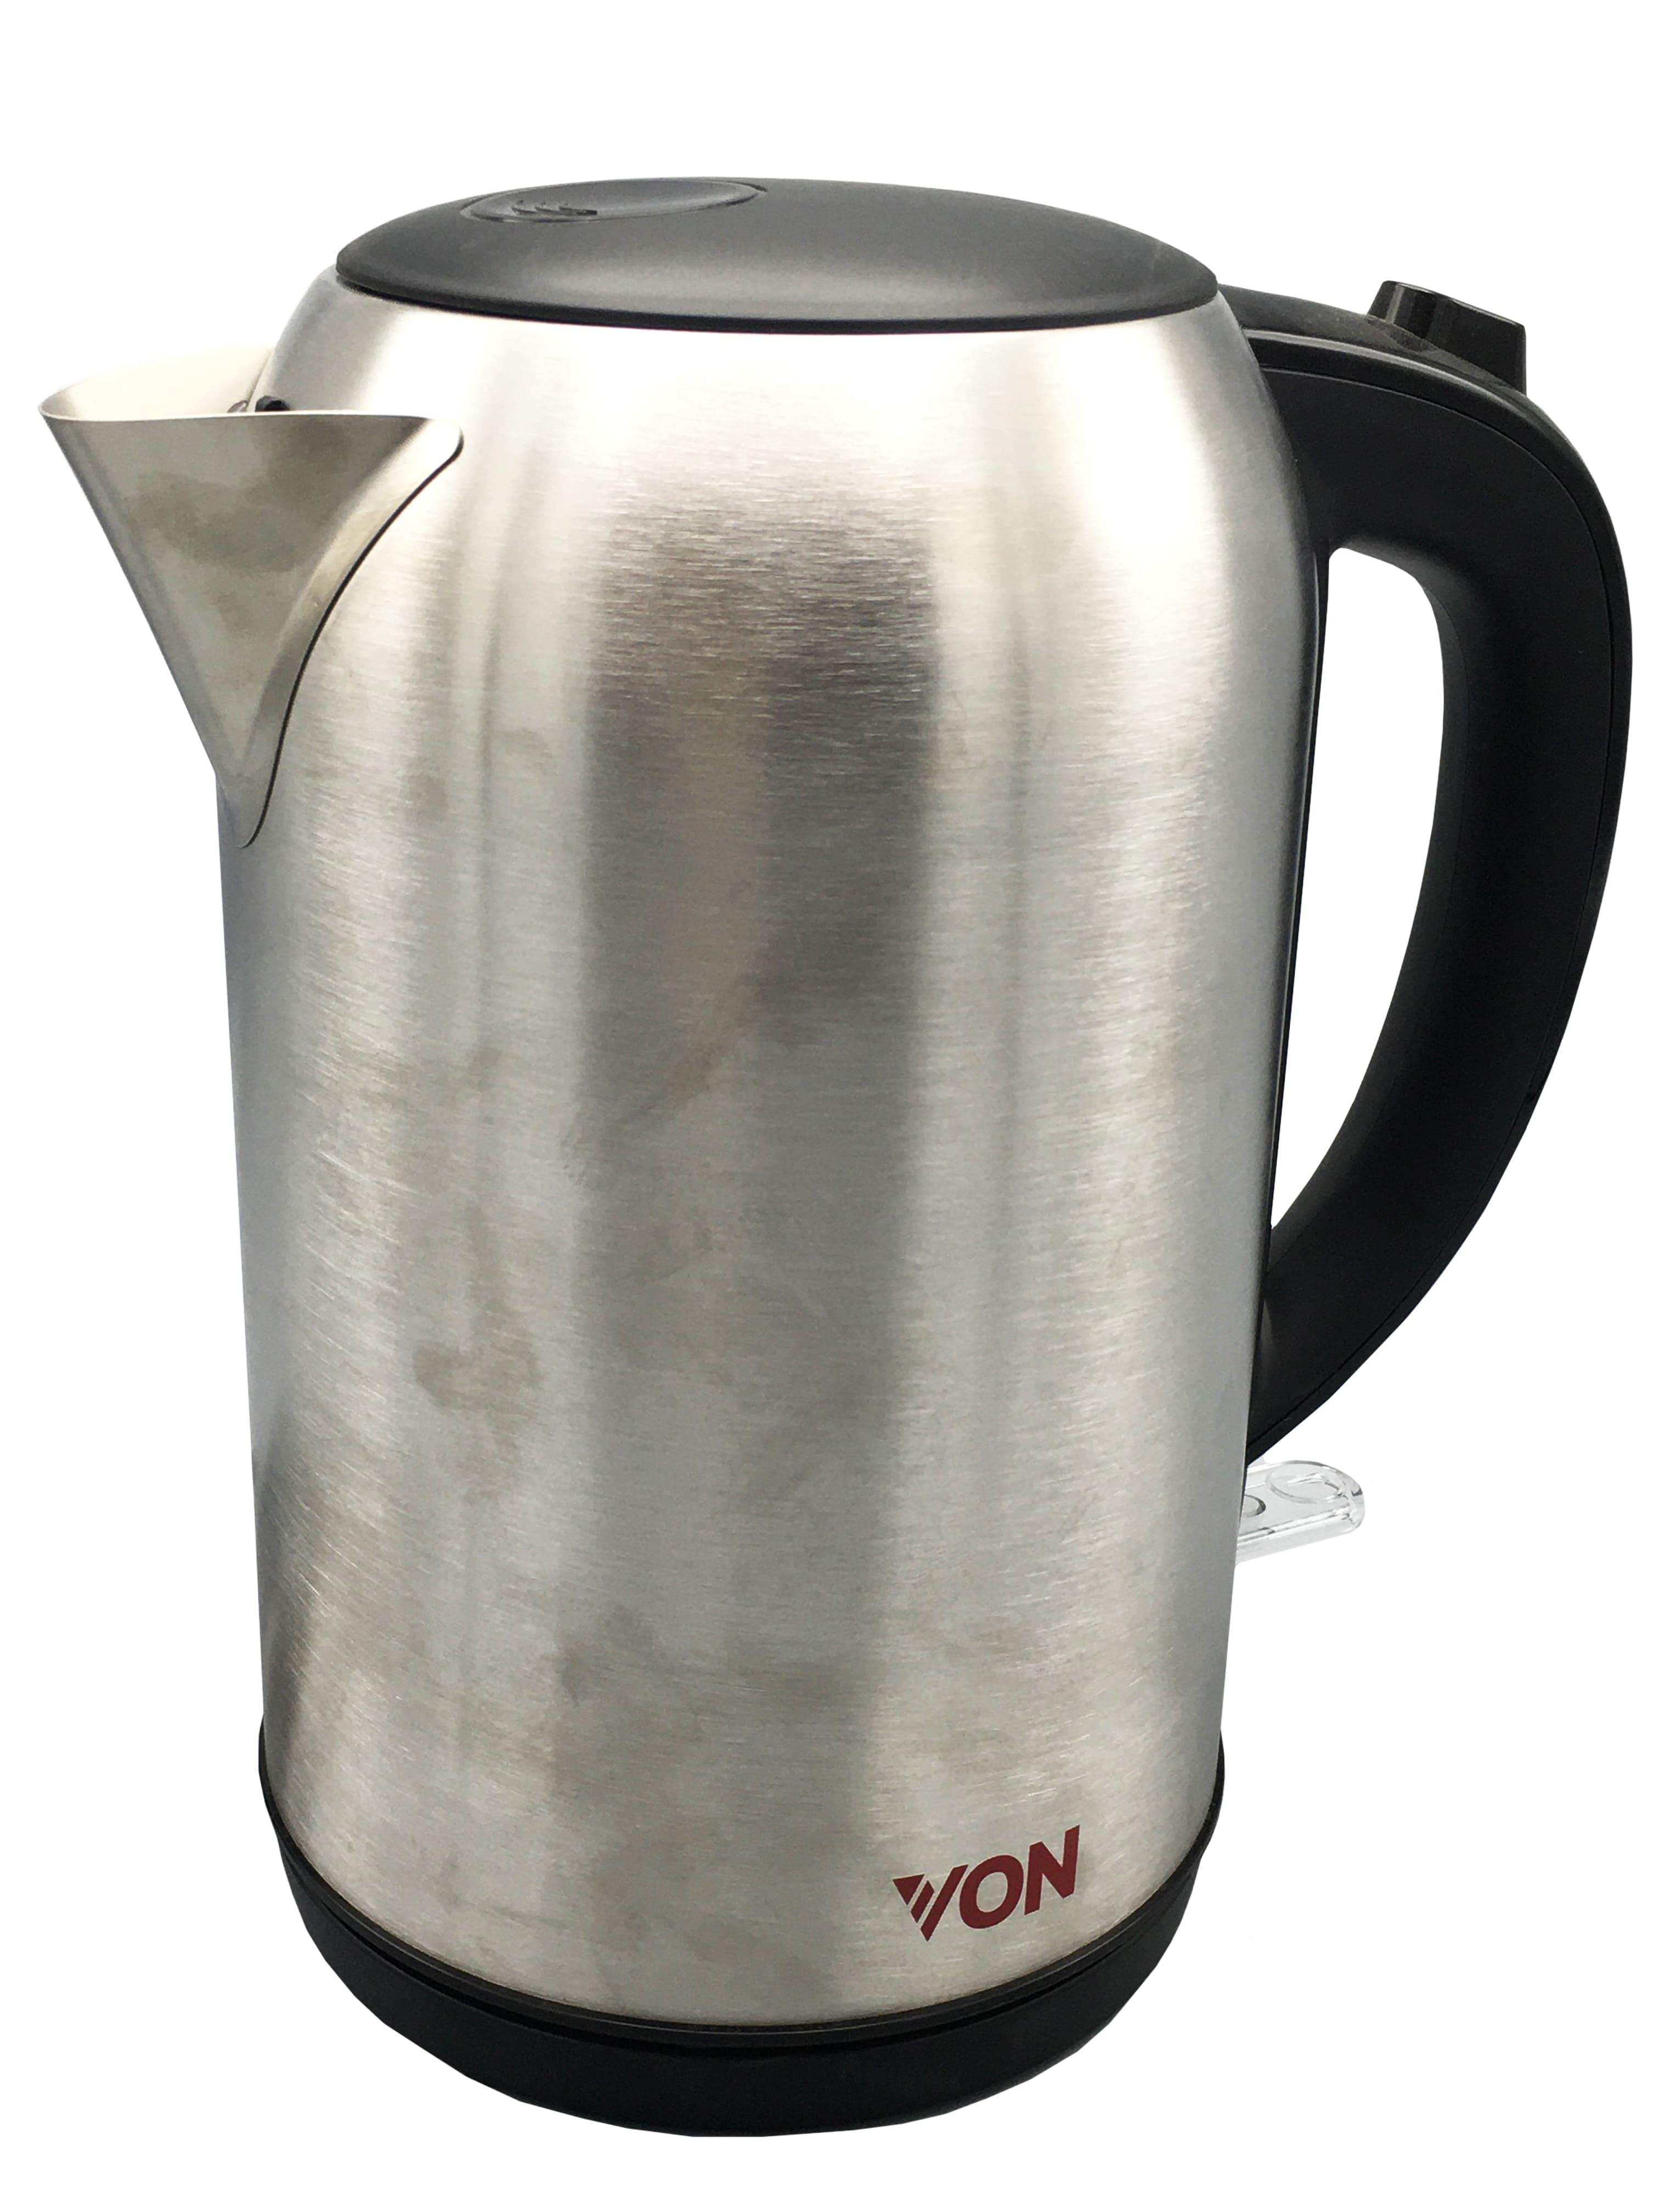 Von VSKL17PDX Upright Cordless Kettle, 1.7L - Stainless steel Tanzania